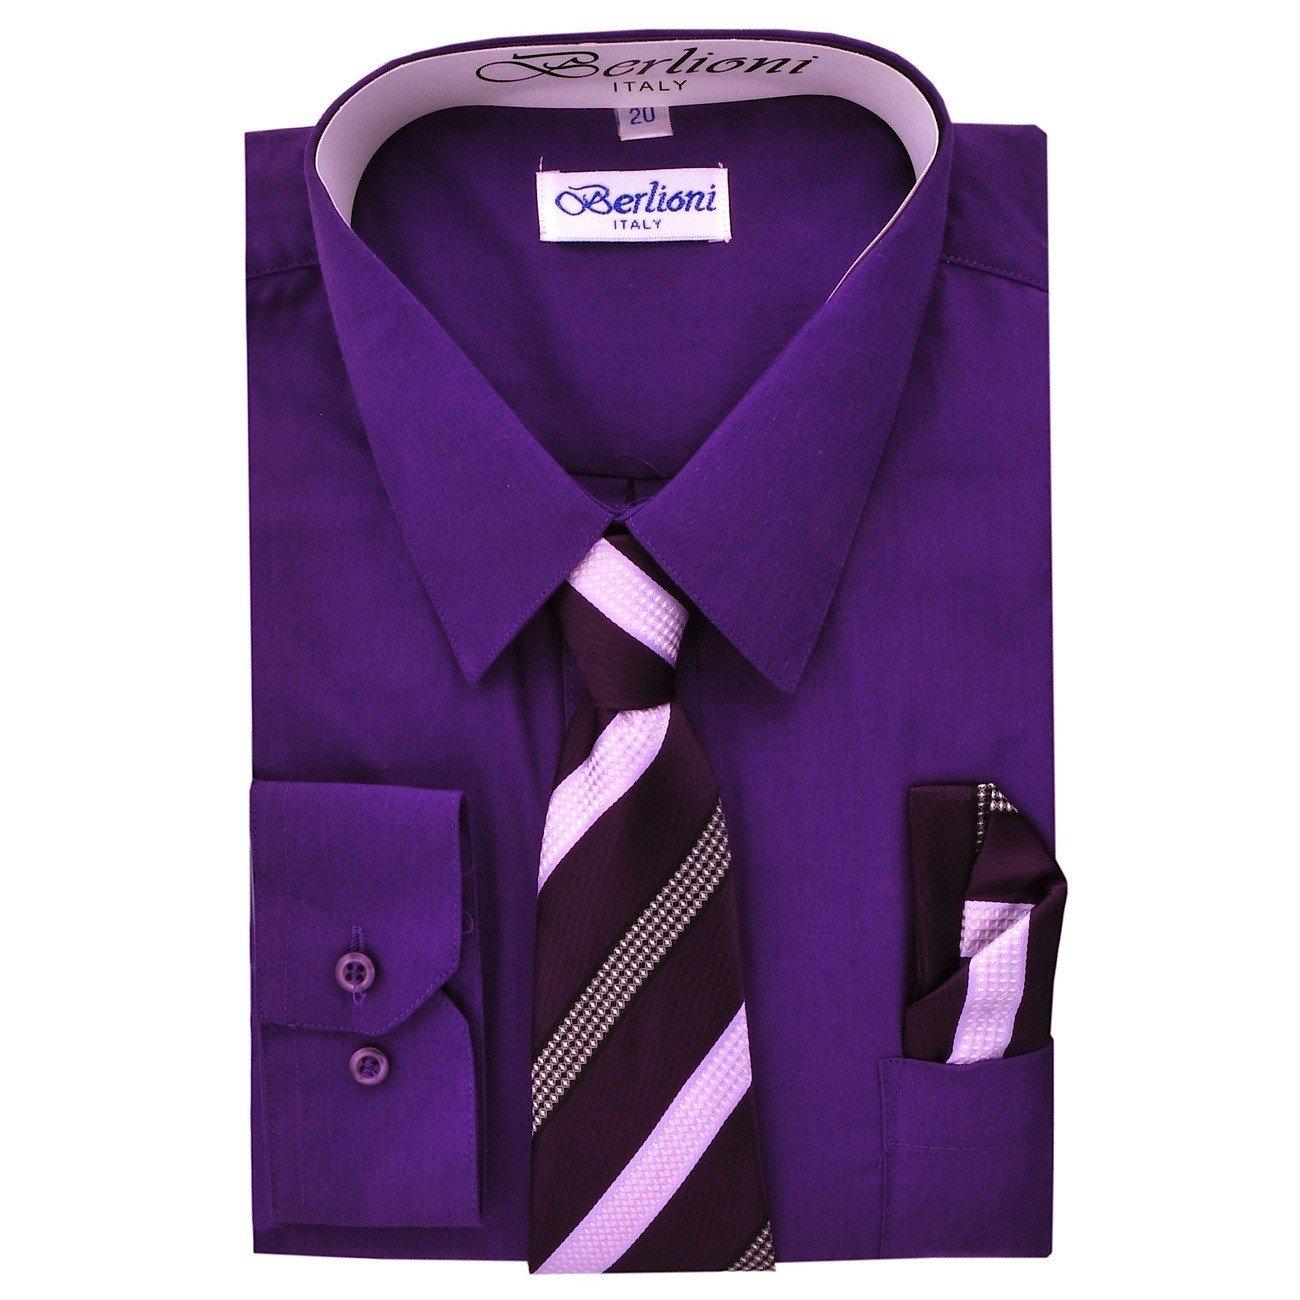 Elegant Boys Button Down Purple (723) Dress Shirt/Necktie/Hanky